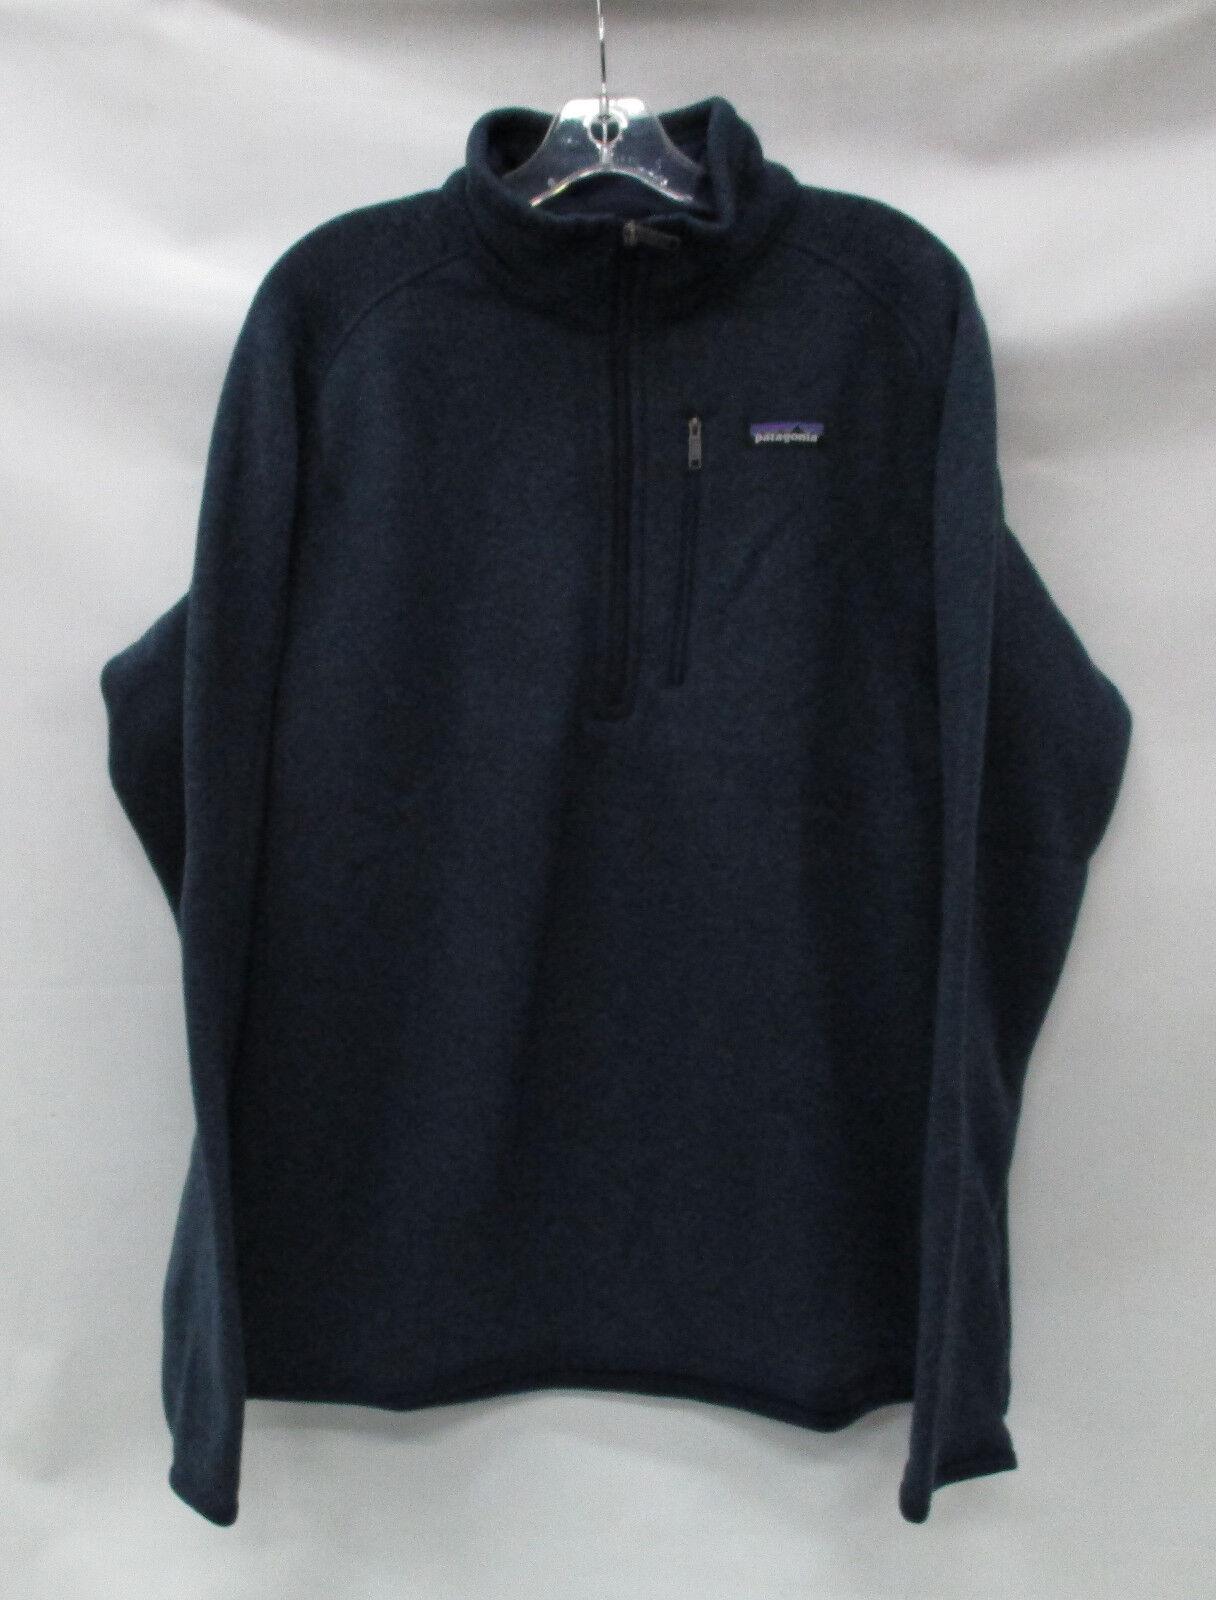 Patagonia  Herren Better Sweater 1/4 Zip Pullover 25522 Classic Navy Größe Small